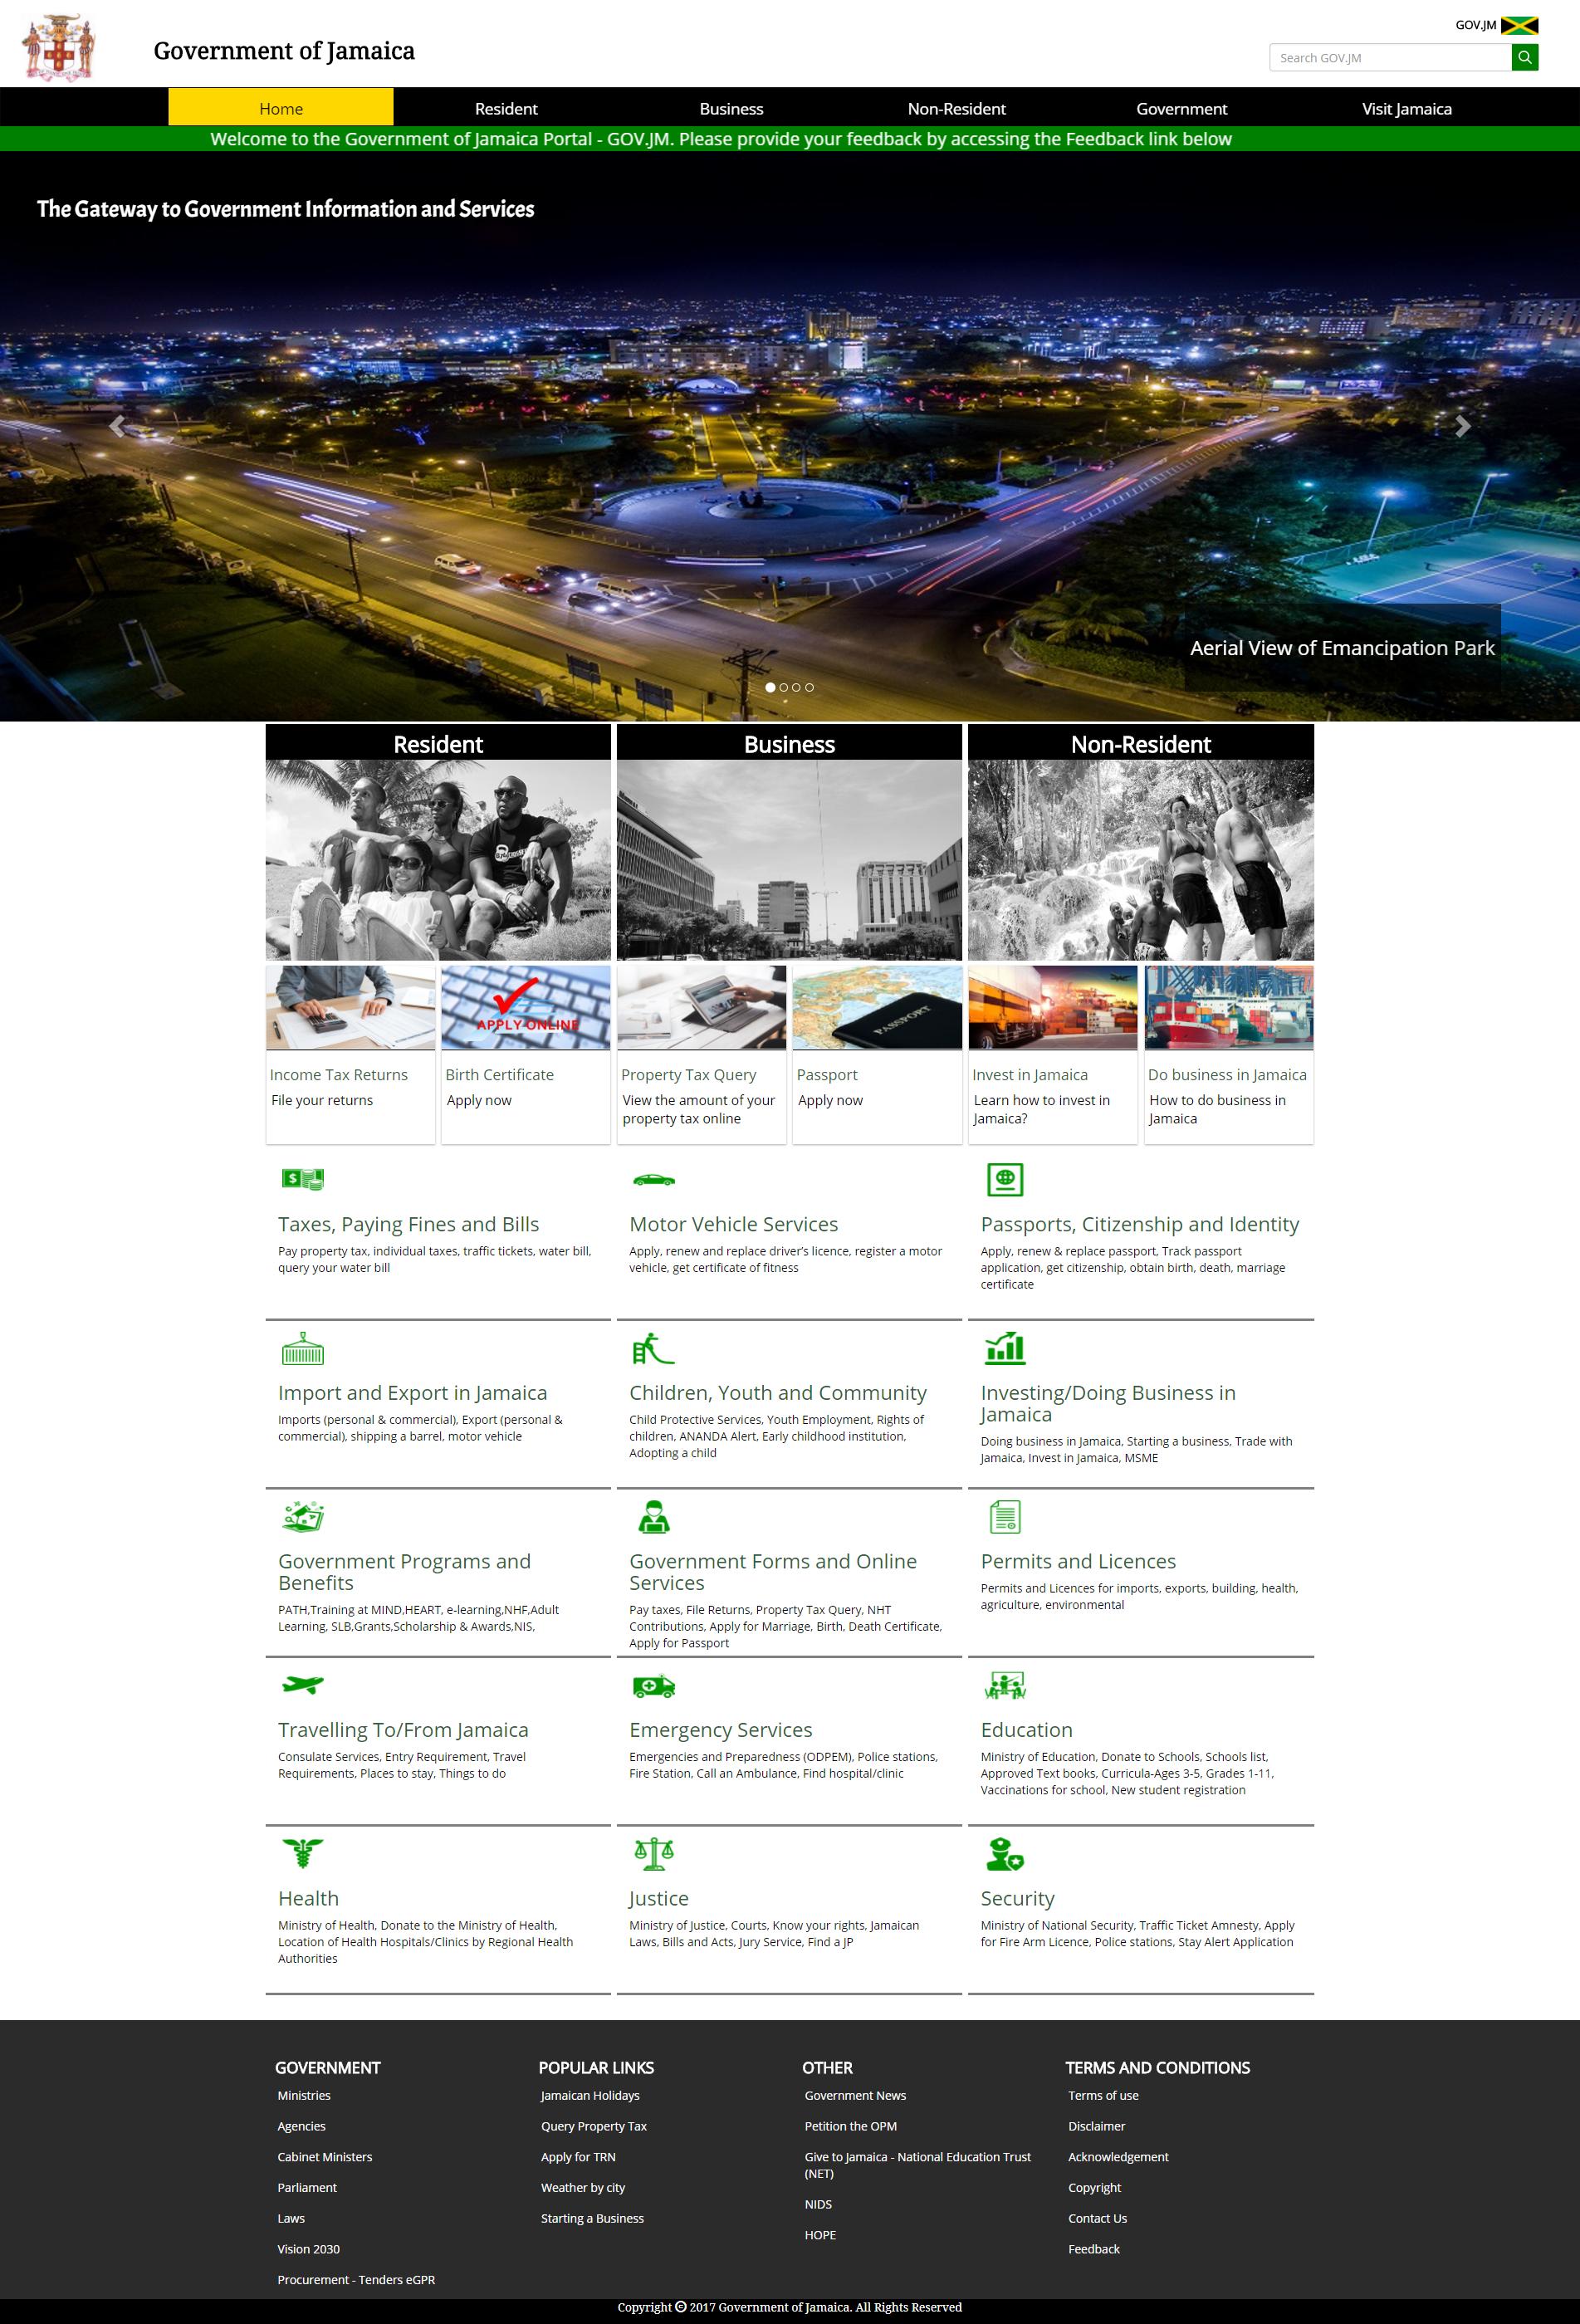 Homepage of GOV.JM